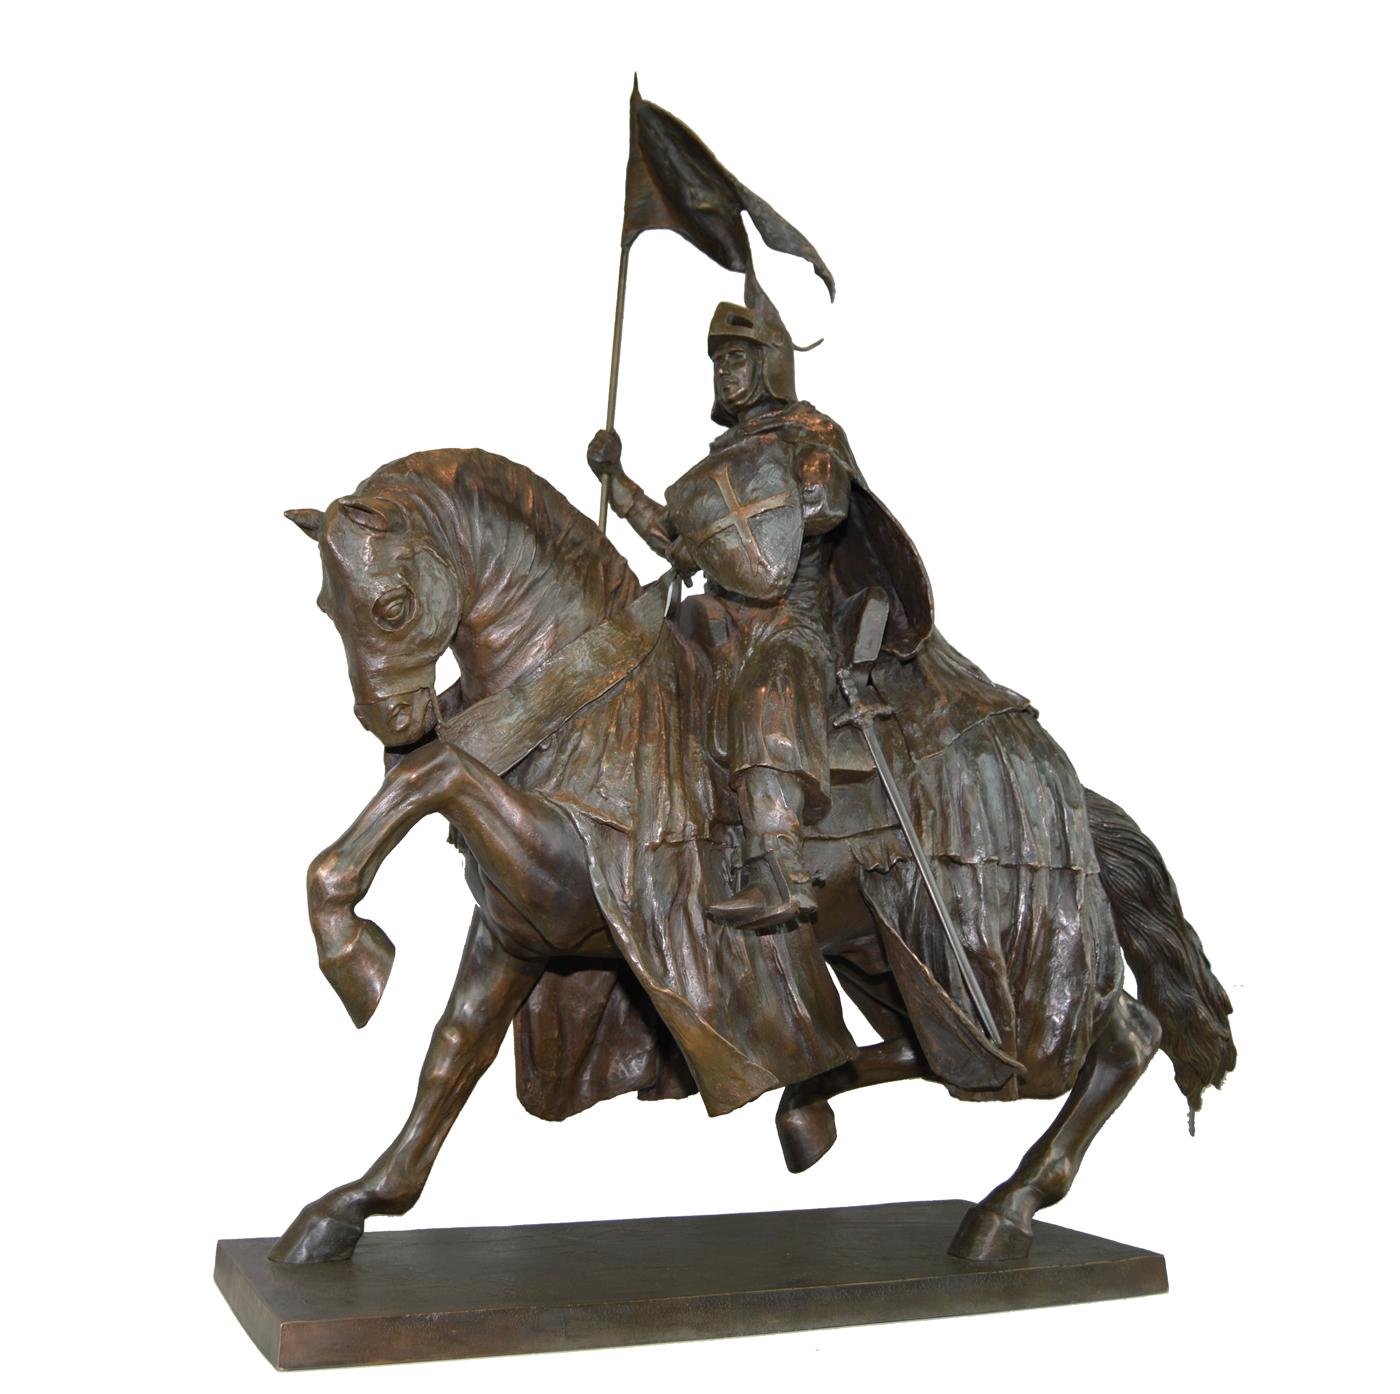 Escultura Caballero Templario historica en Madrid